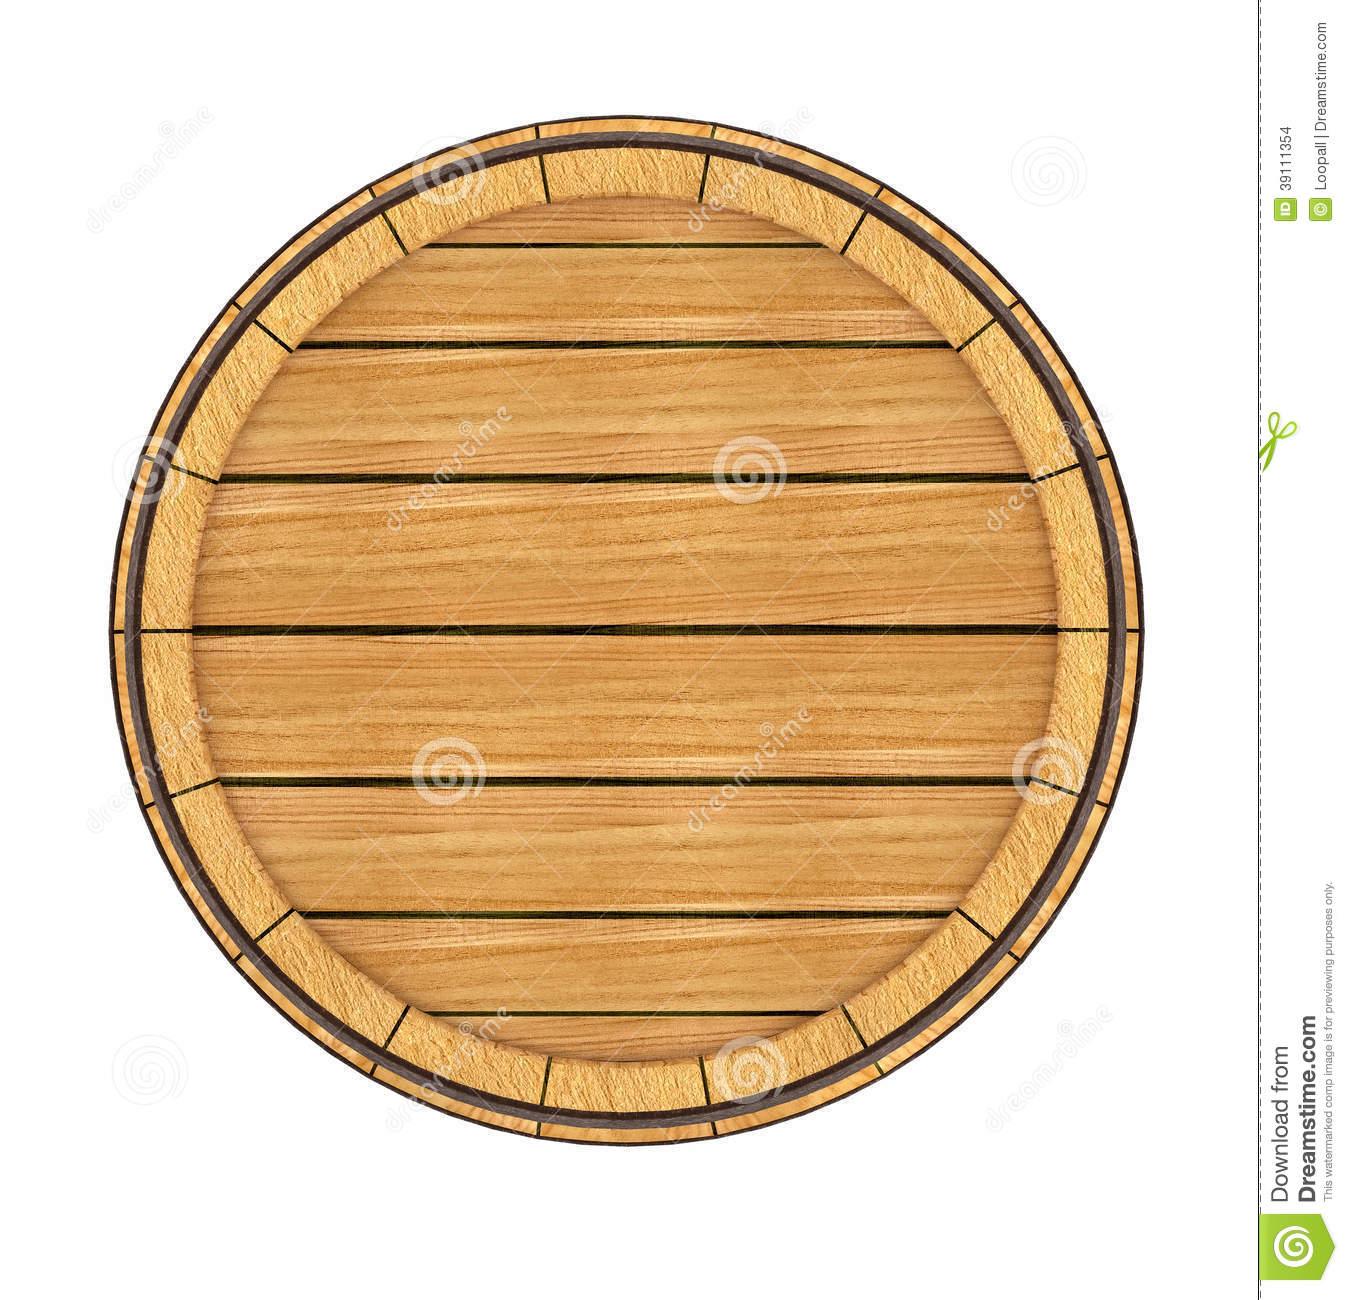 Oak Barrel Clipart - Clipart Suggest